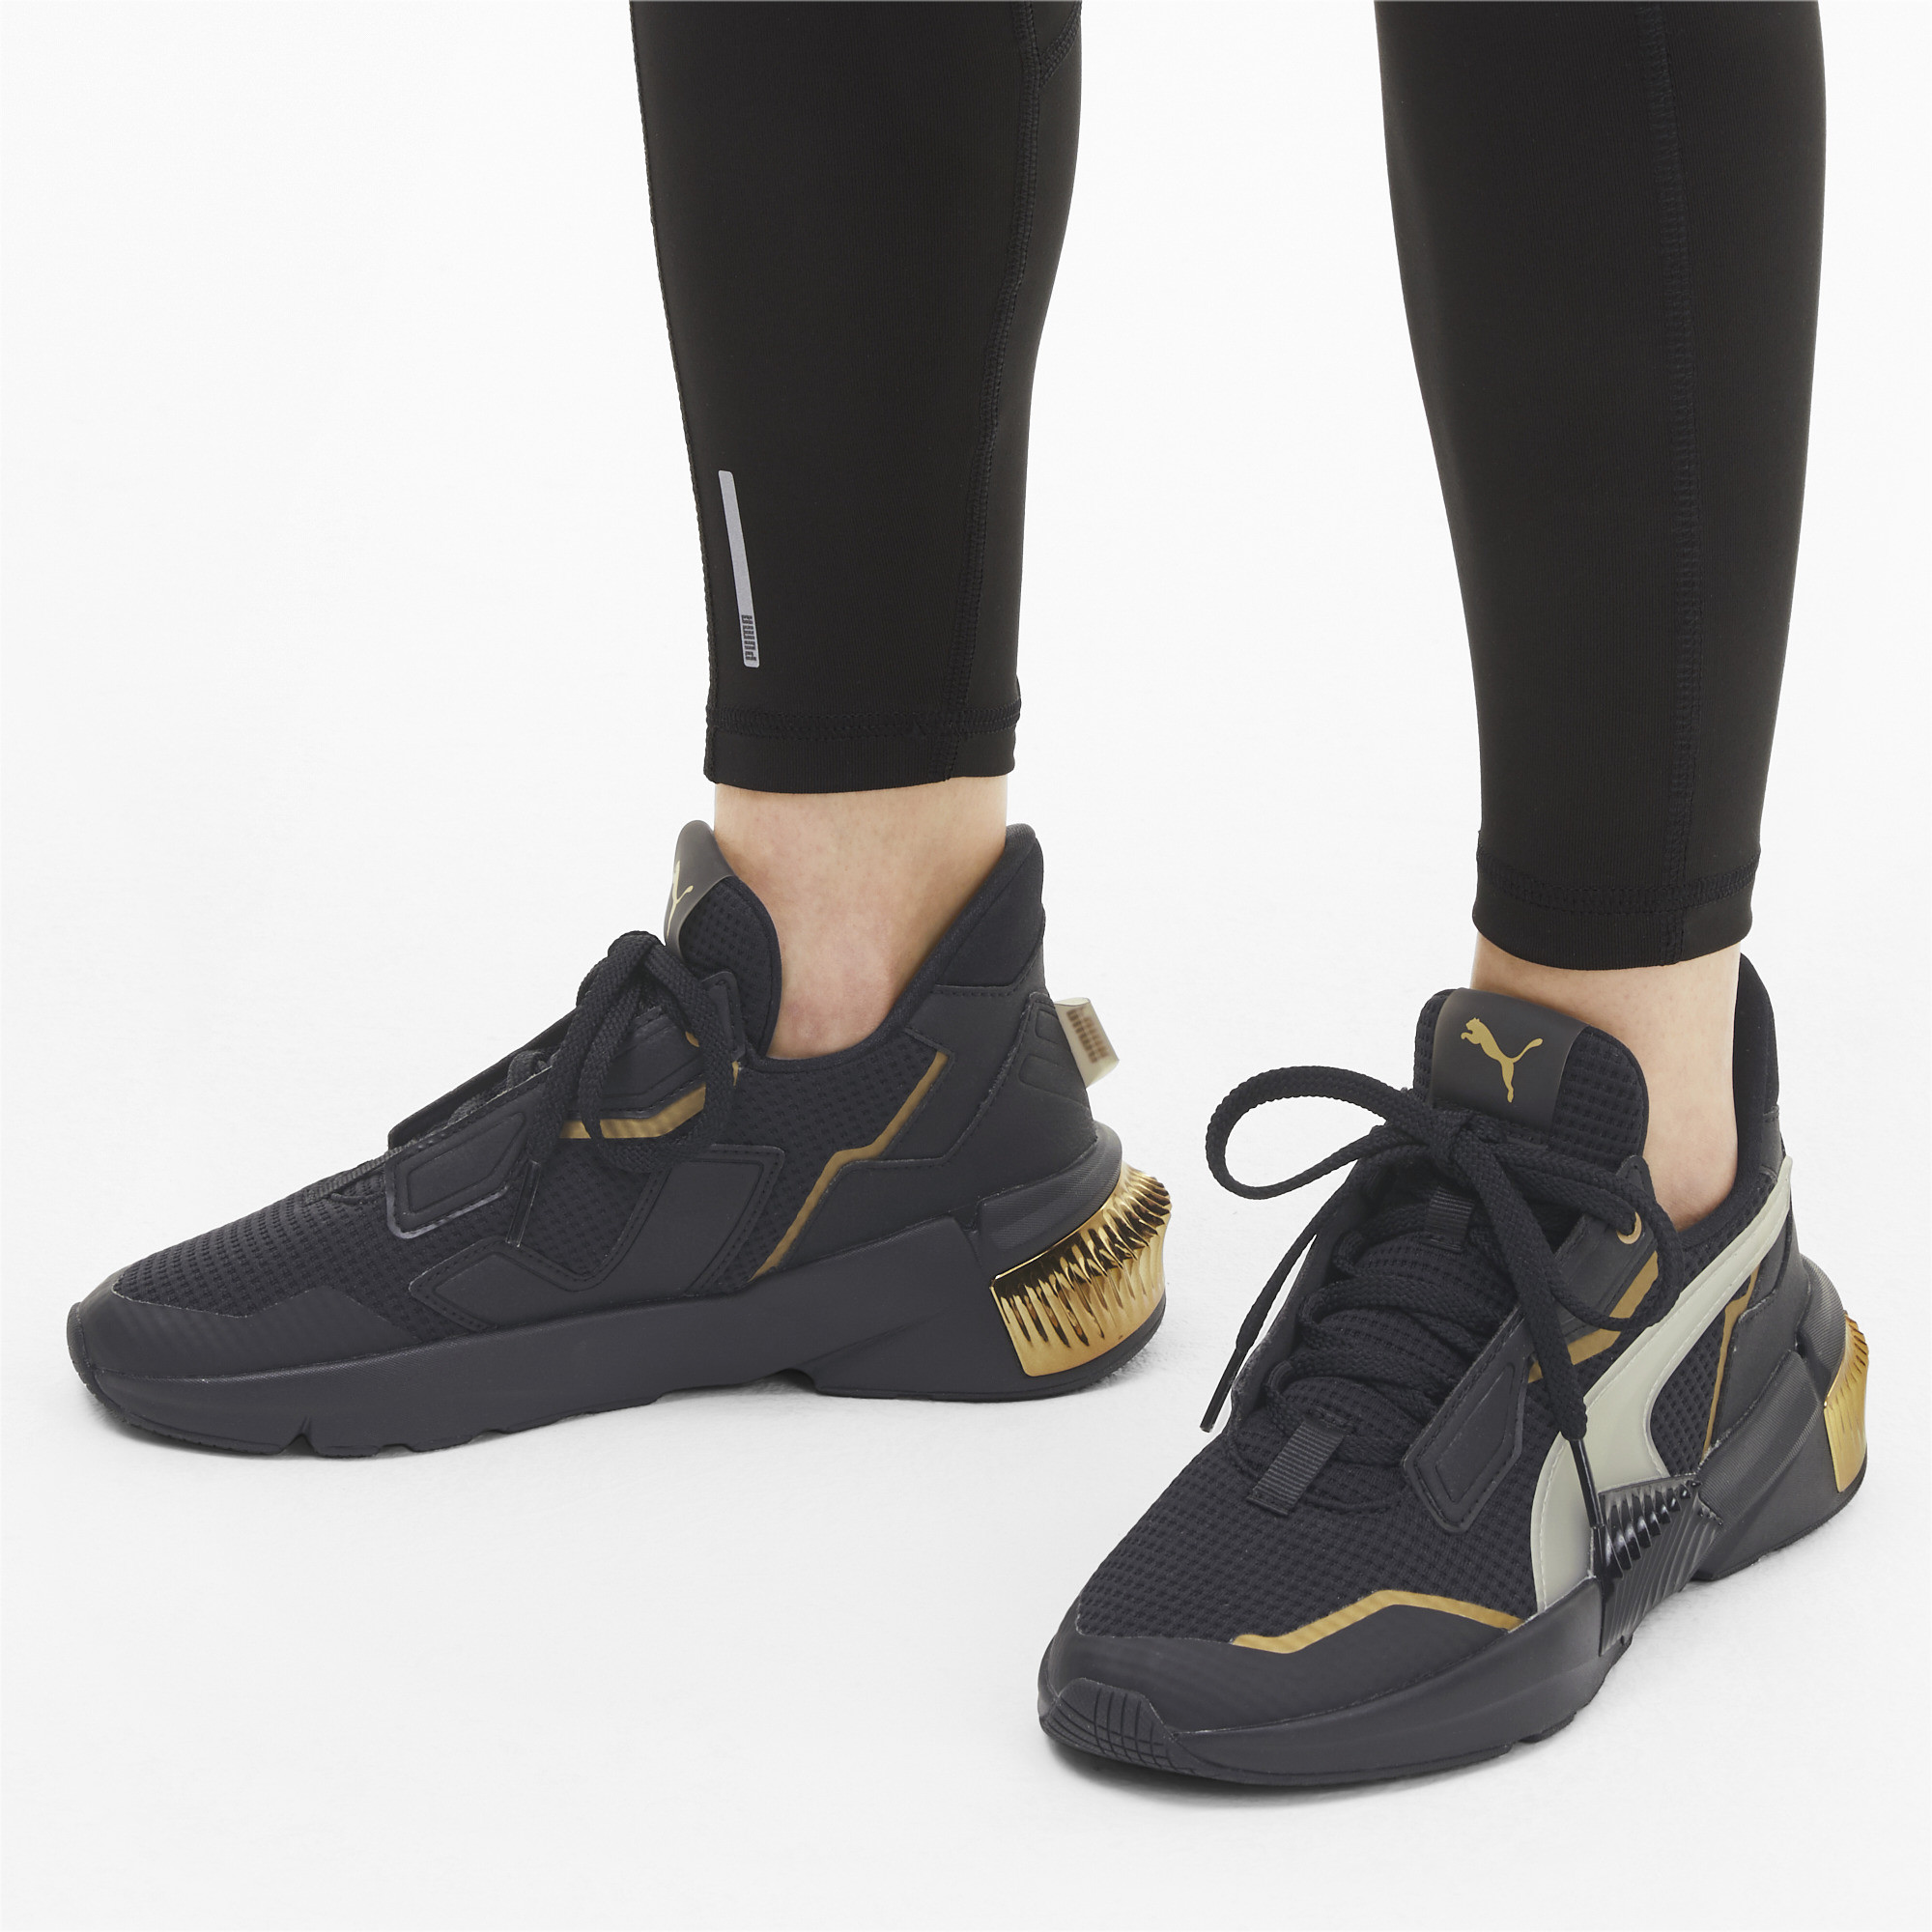 Indexbild 10 - PUMA Provoke XT Damen Trainingsschuhe Frauen Stiefelette Training Neu